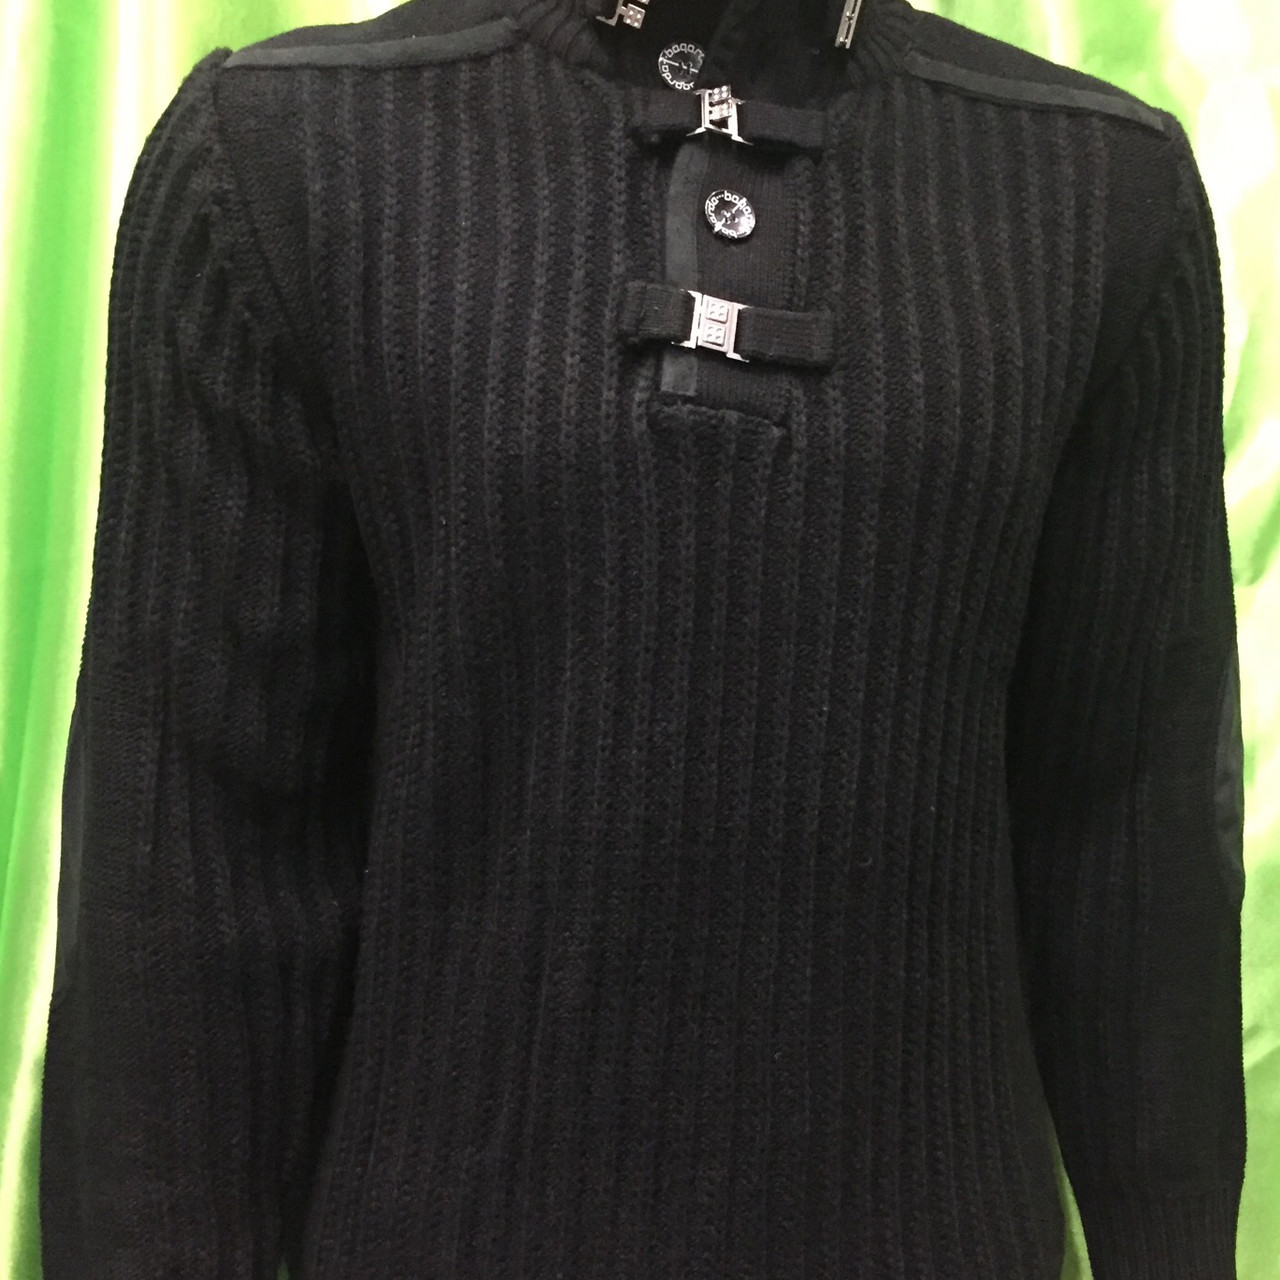 Мужской тёплый свитер Турция, фото 1